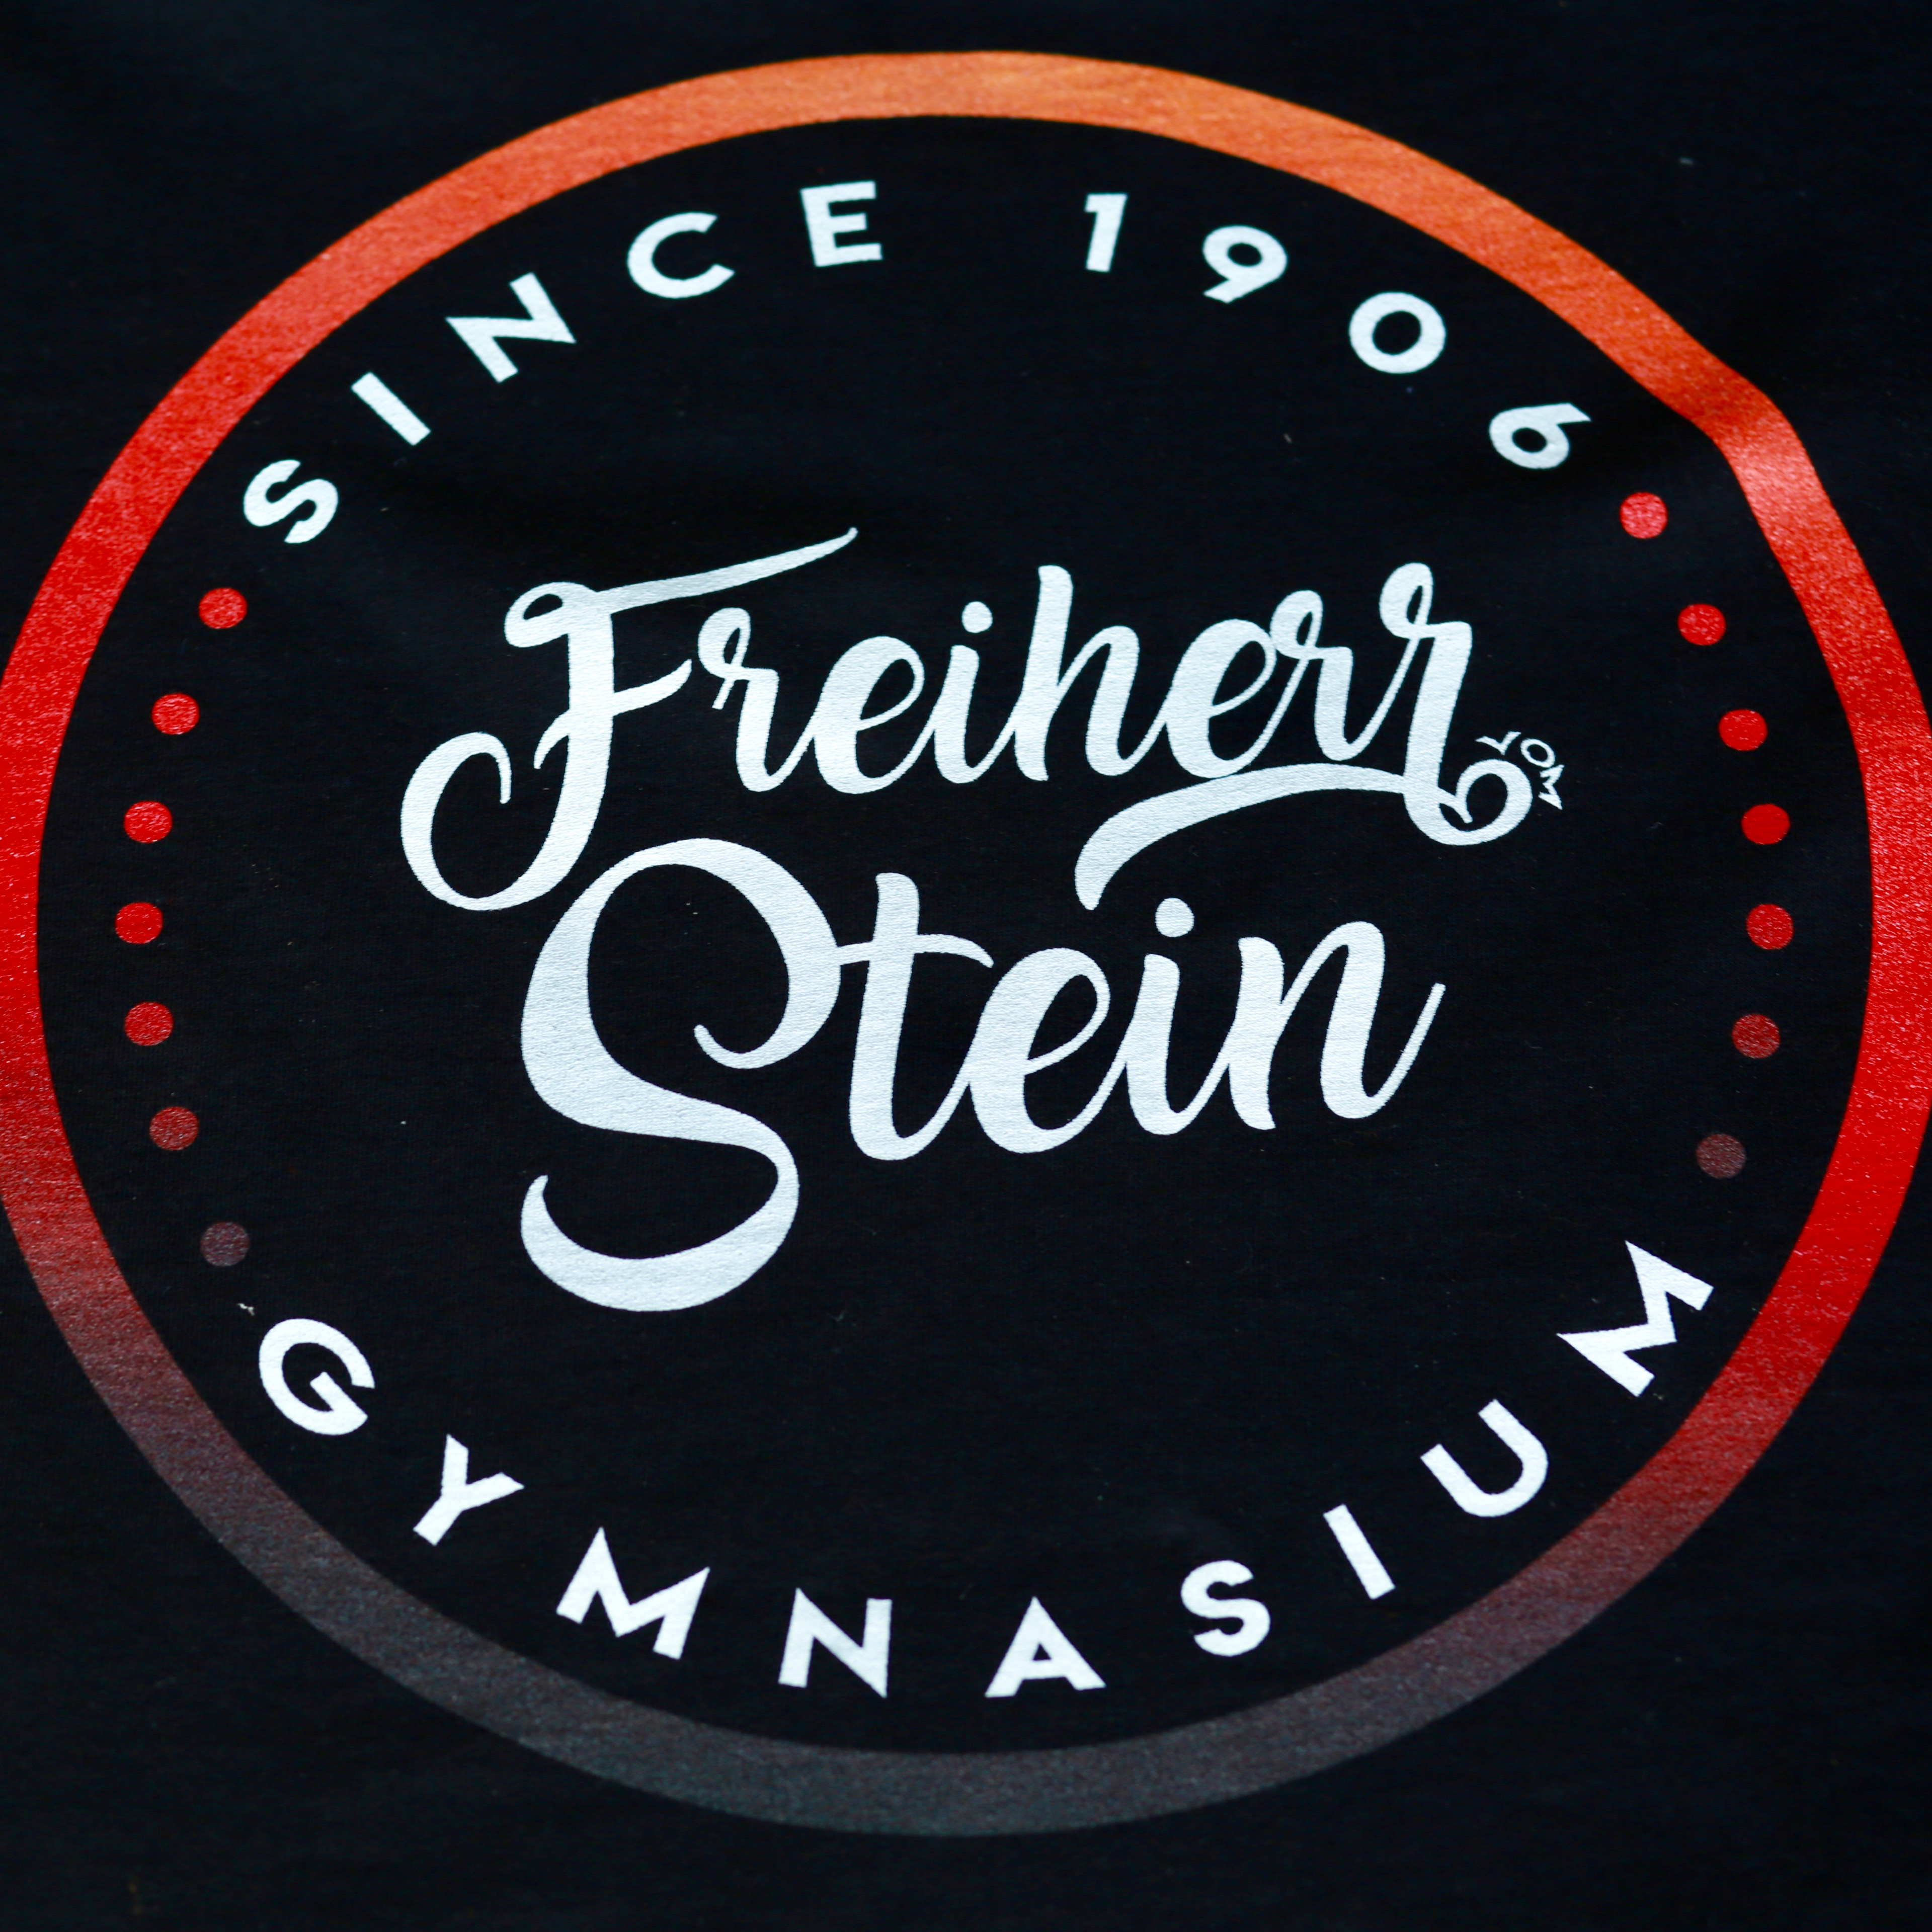 http://www.steingymnasium.de/wp-content/uploads/2017/06/FX5A7089.jpg